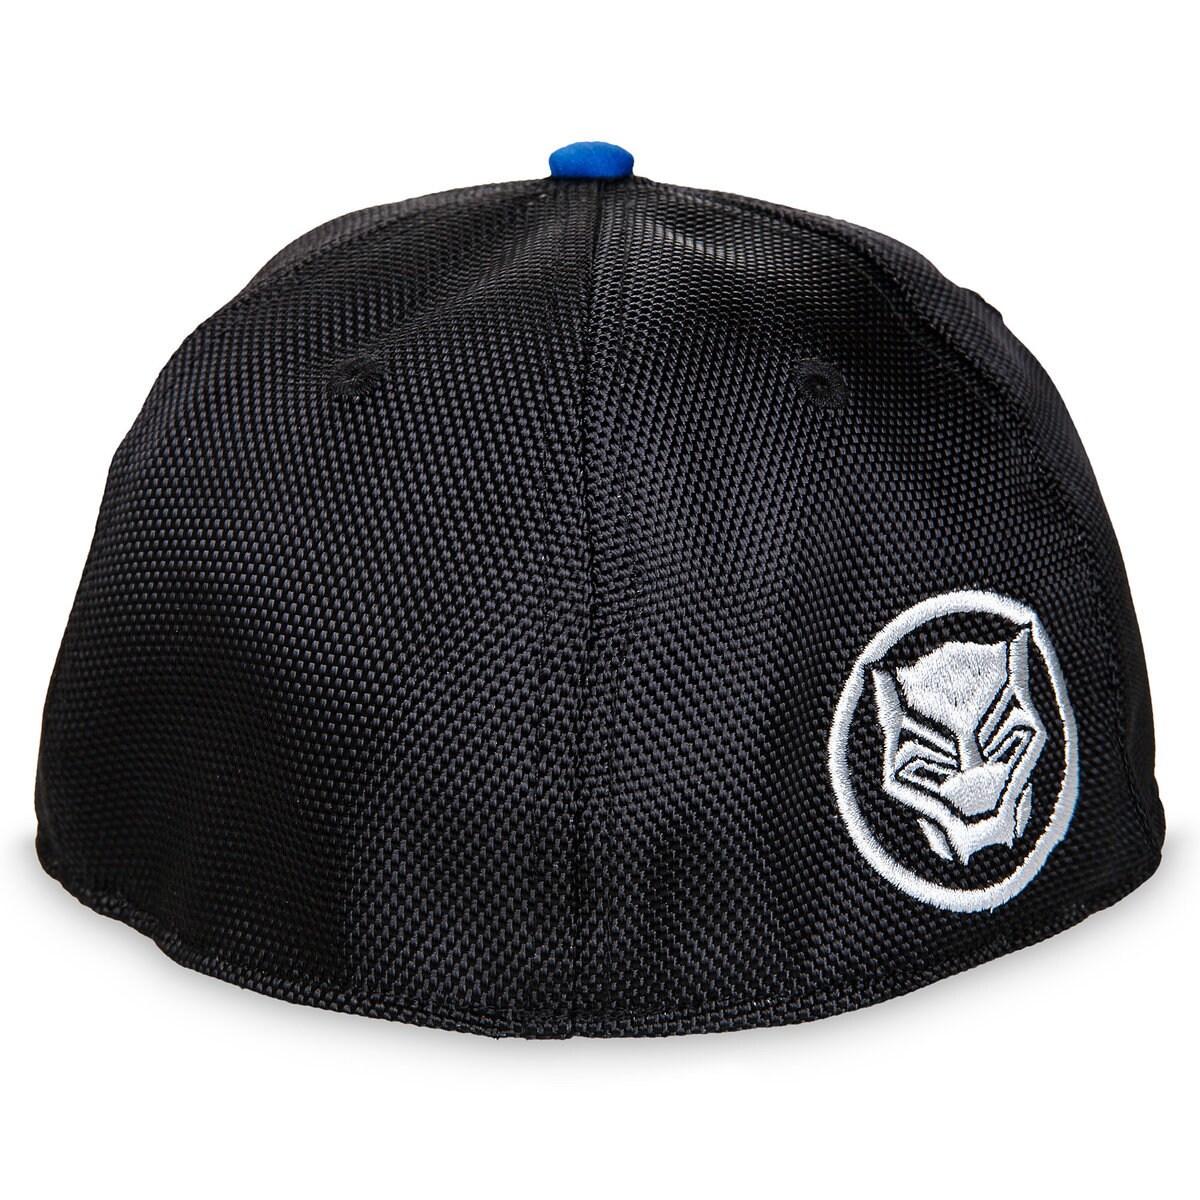 d1fc475b1 Black Panther Hat for Kids